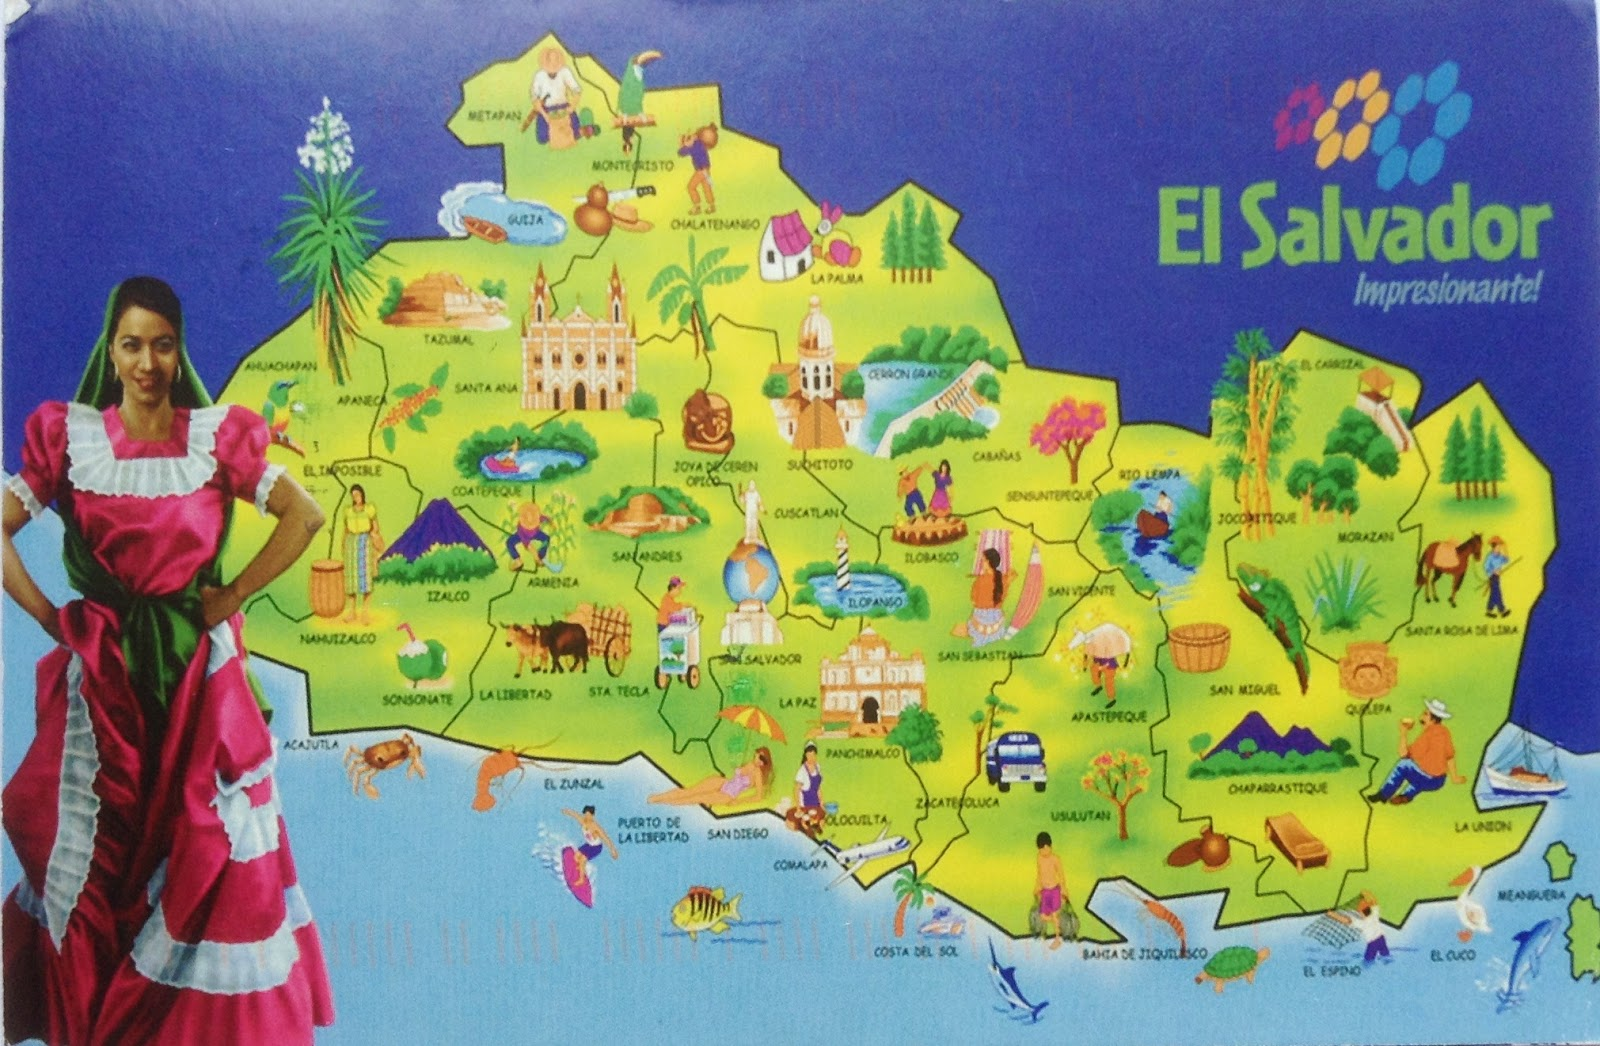 Postcard Footprints From Around The World El Salvador Map - Cities map el salvador map